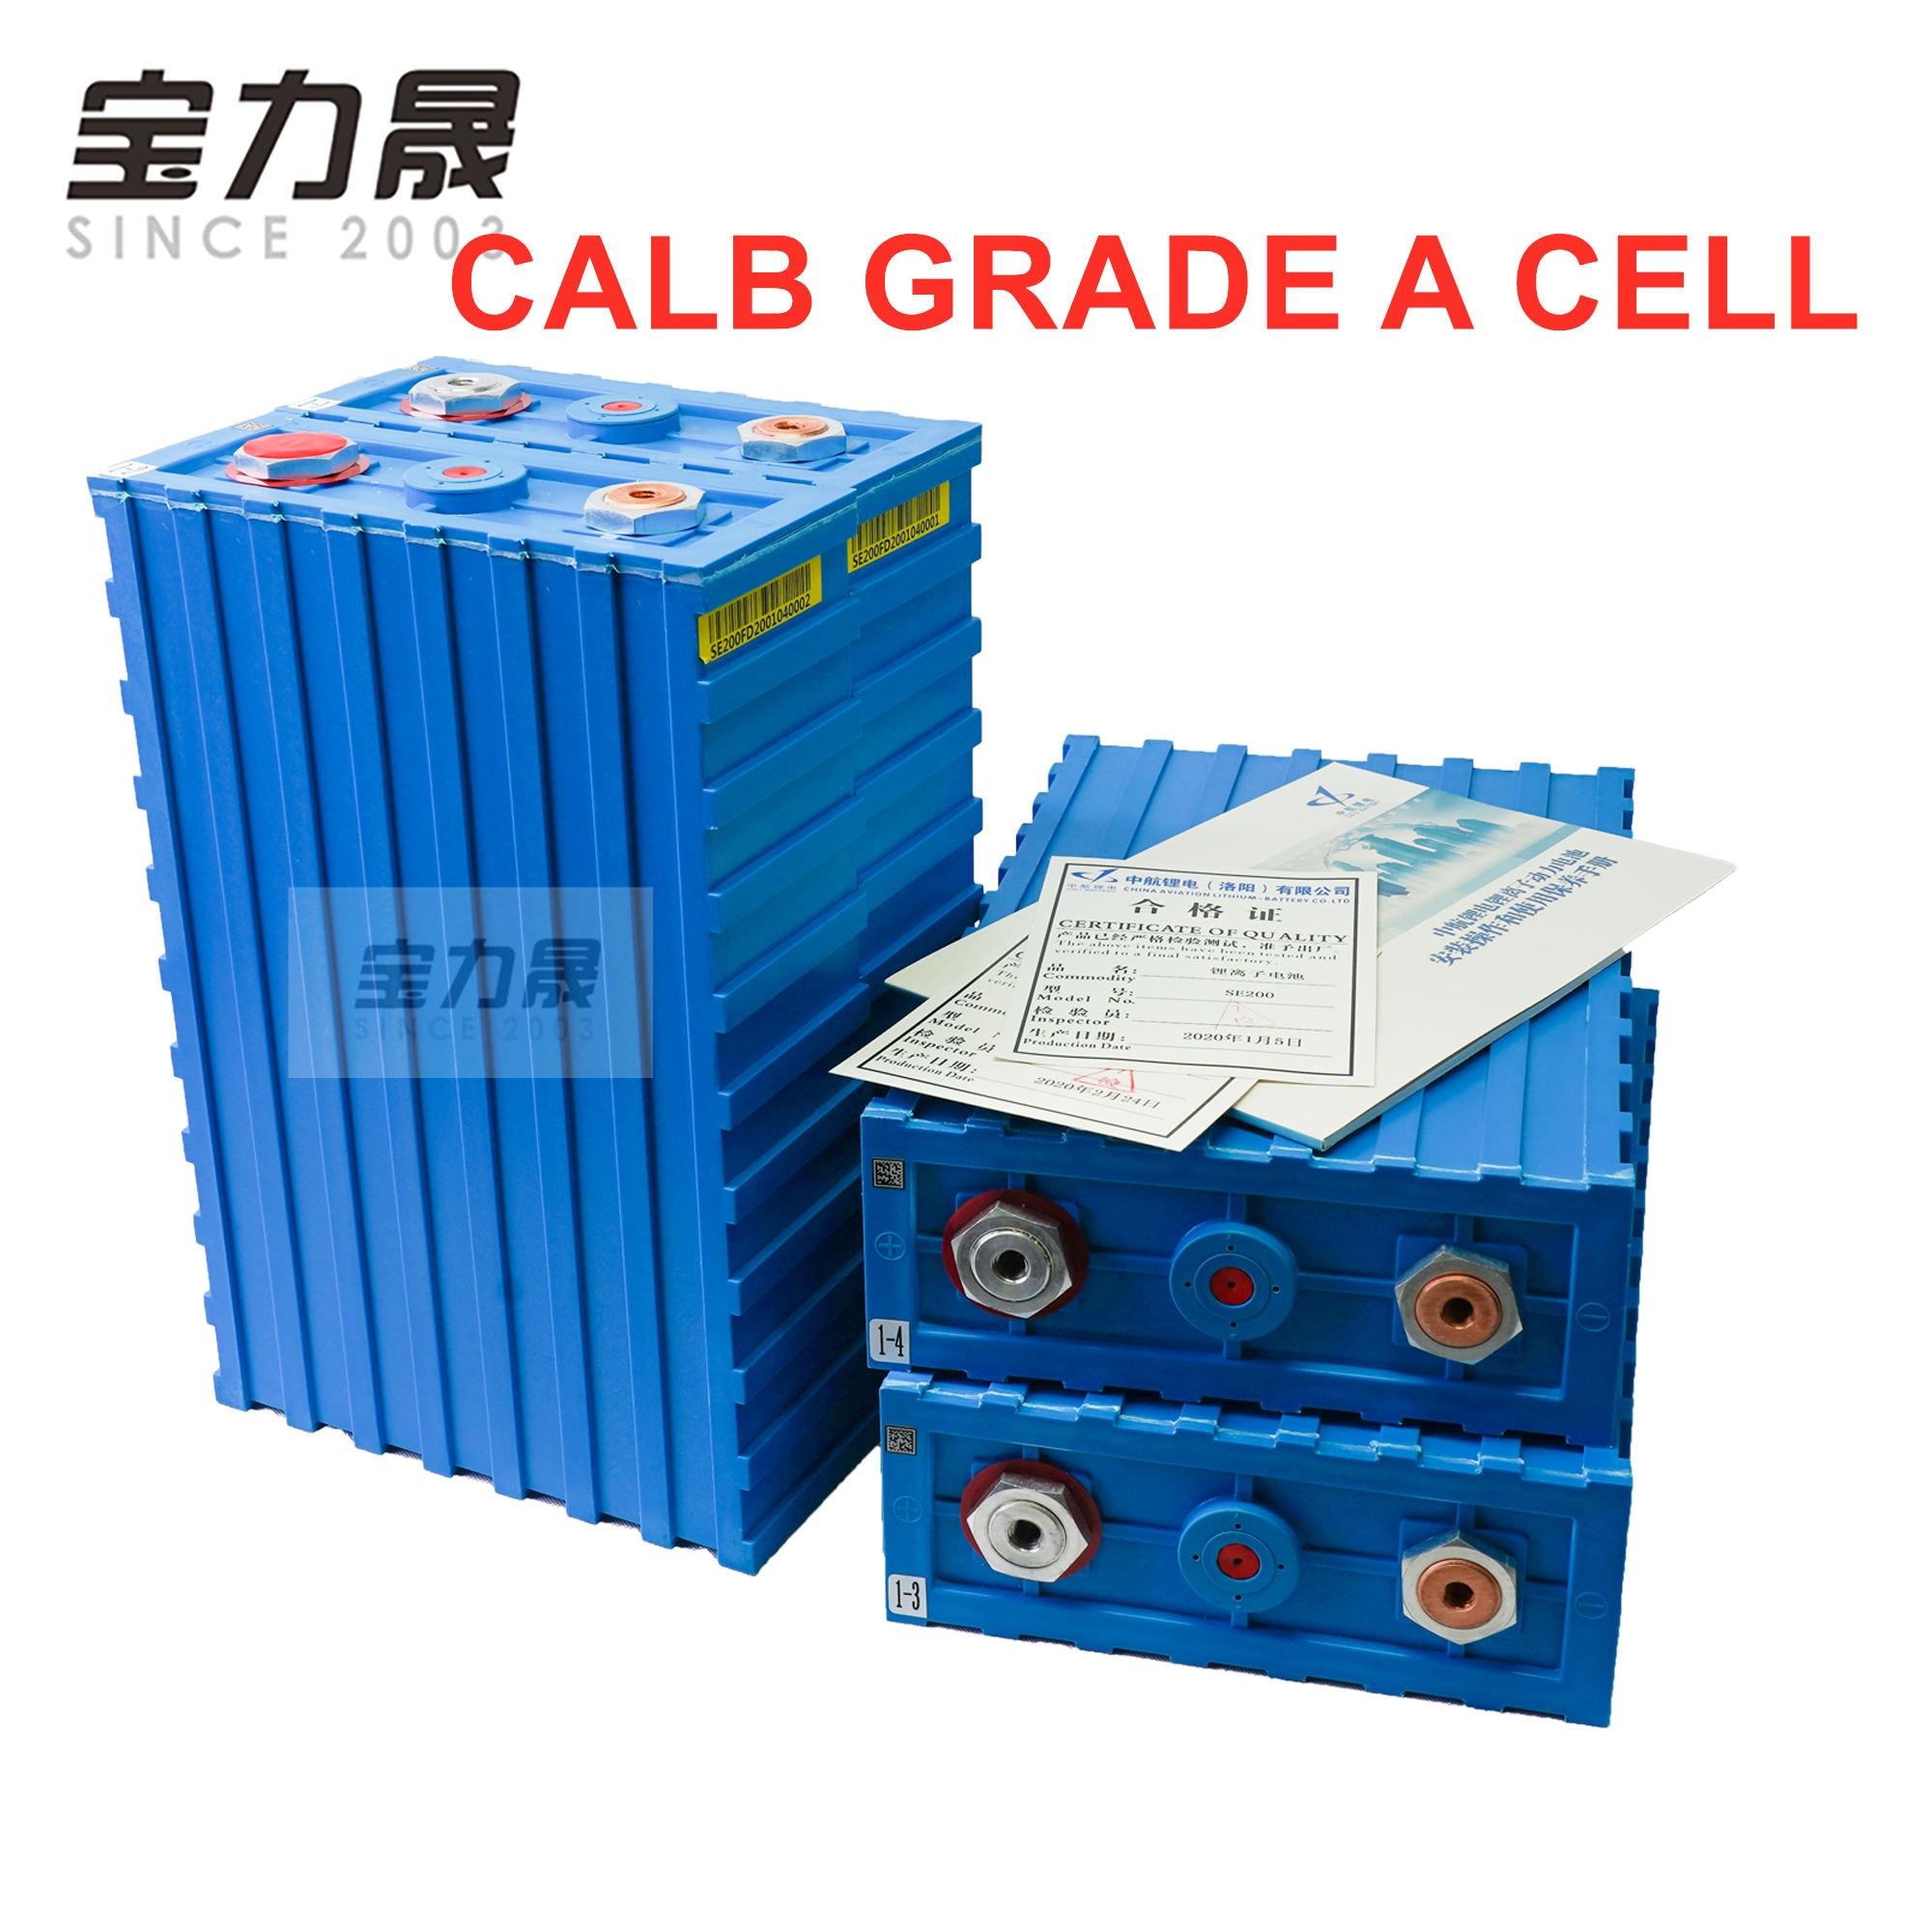 2020 nuevo 3.2V200ah grado A LiFePO4 Célula de baterías recargables CALB SE200FI plástico 12v24V para paquete EV solar US EU AU libre de impuestos